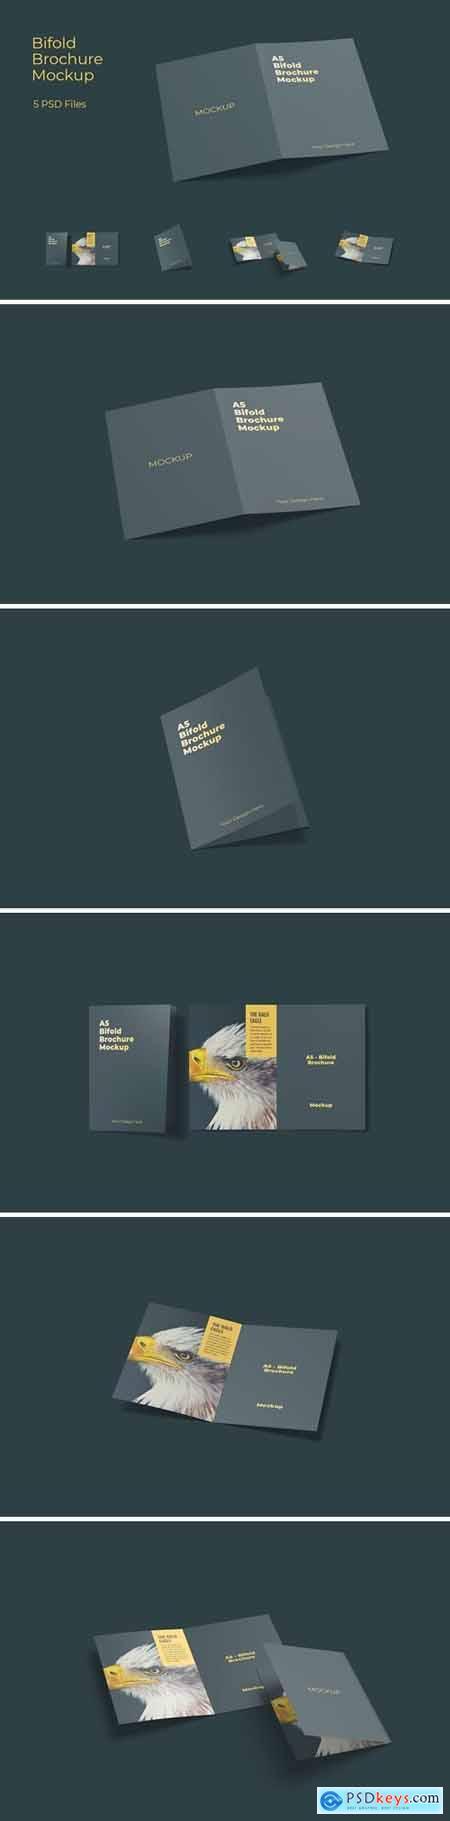 A5 Bifold Brochure Mockup Vol 1